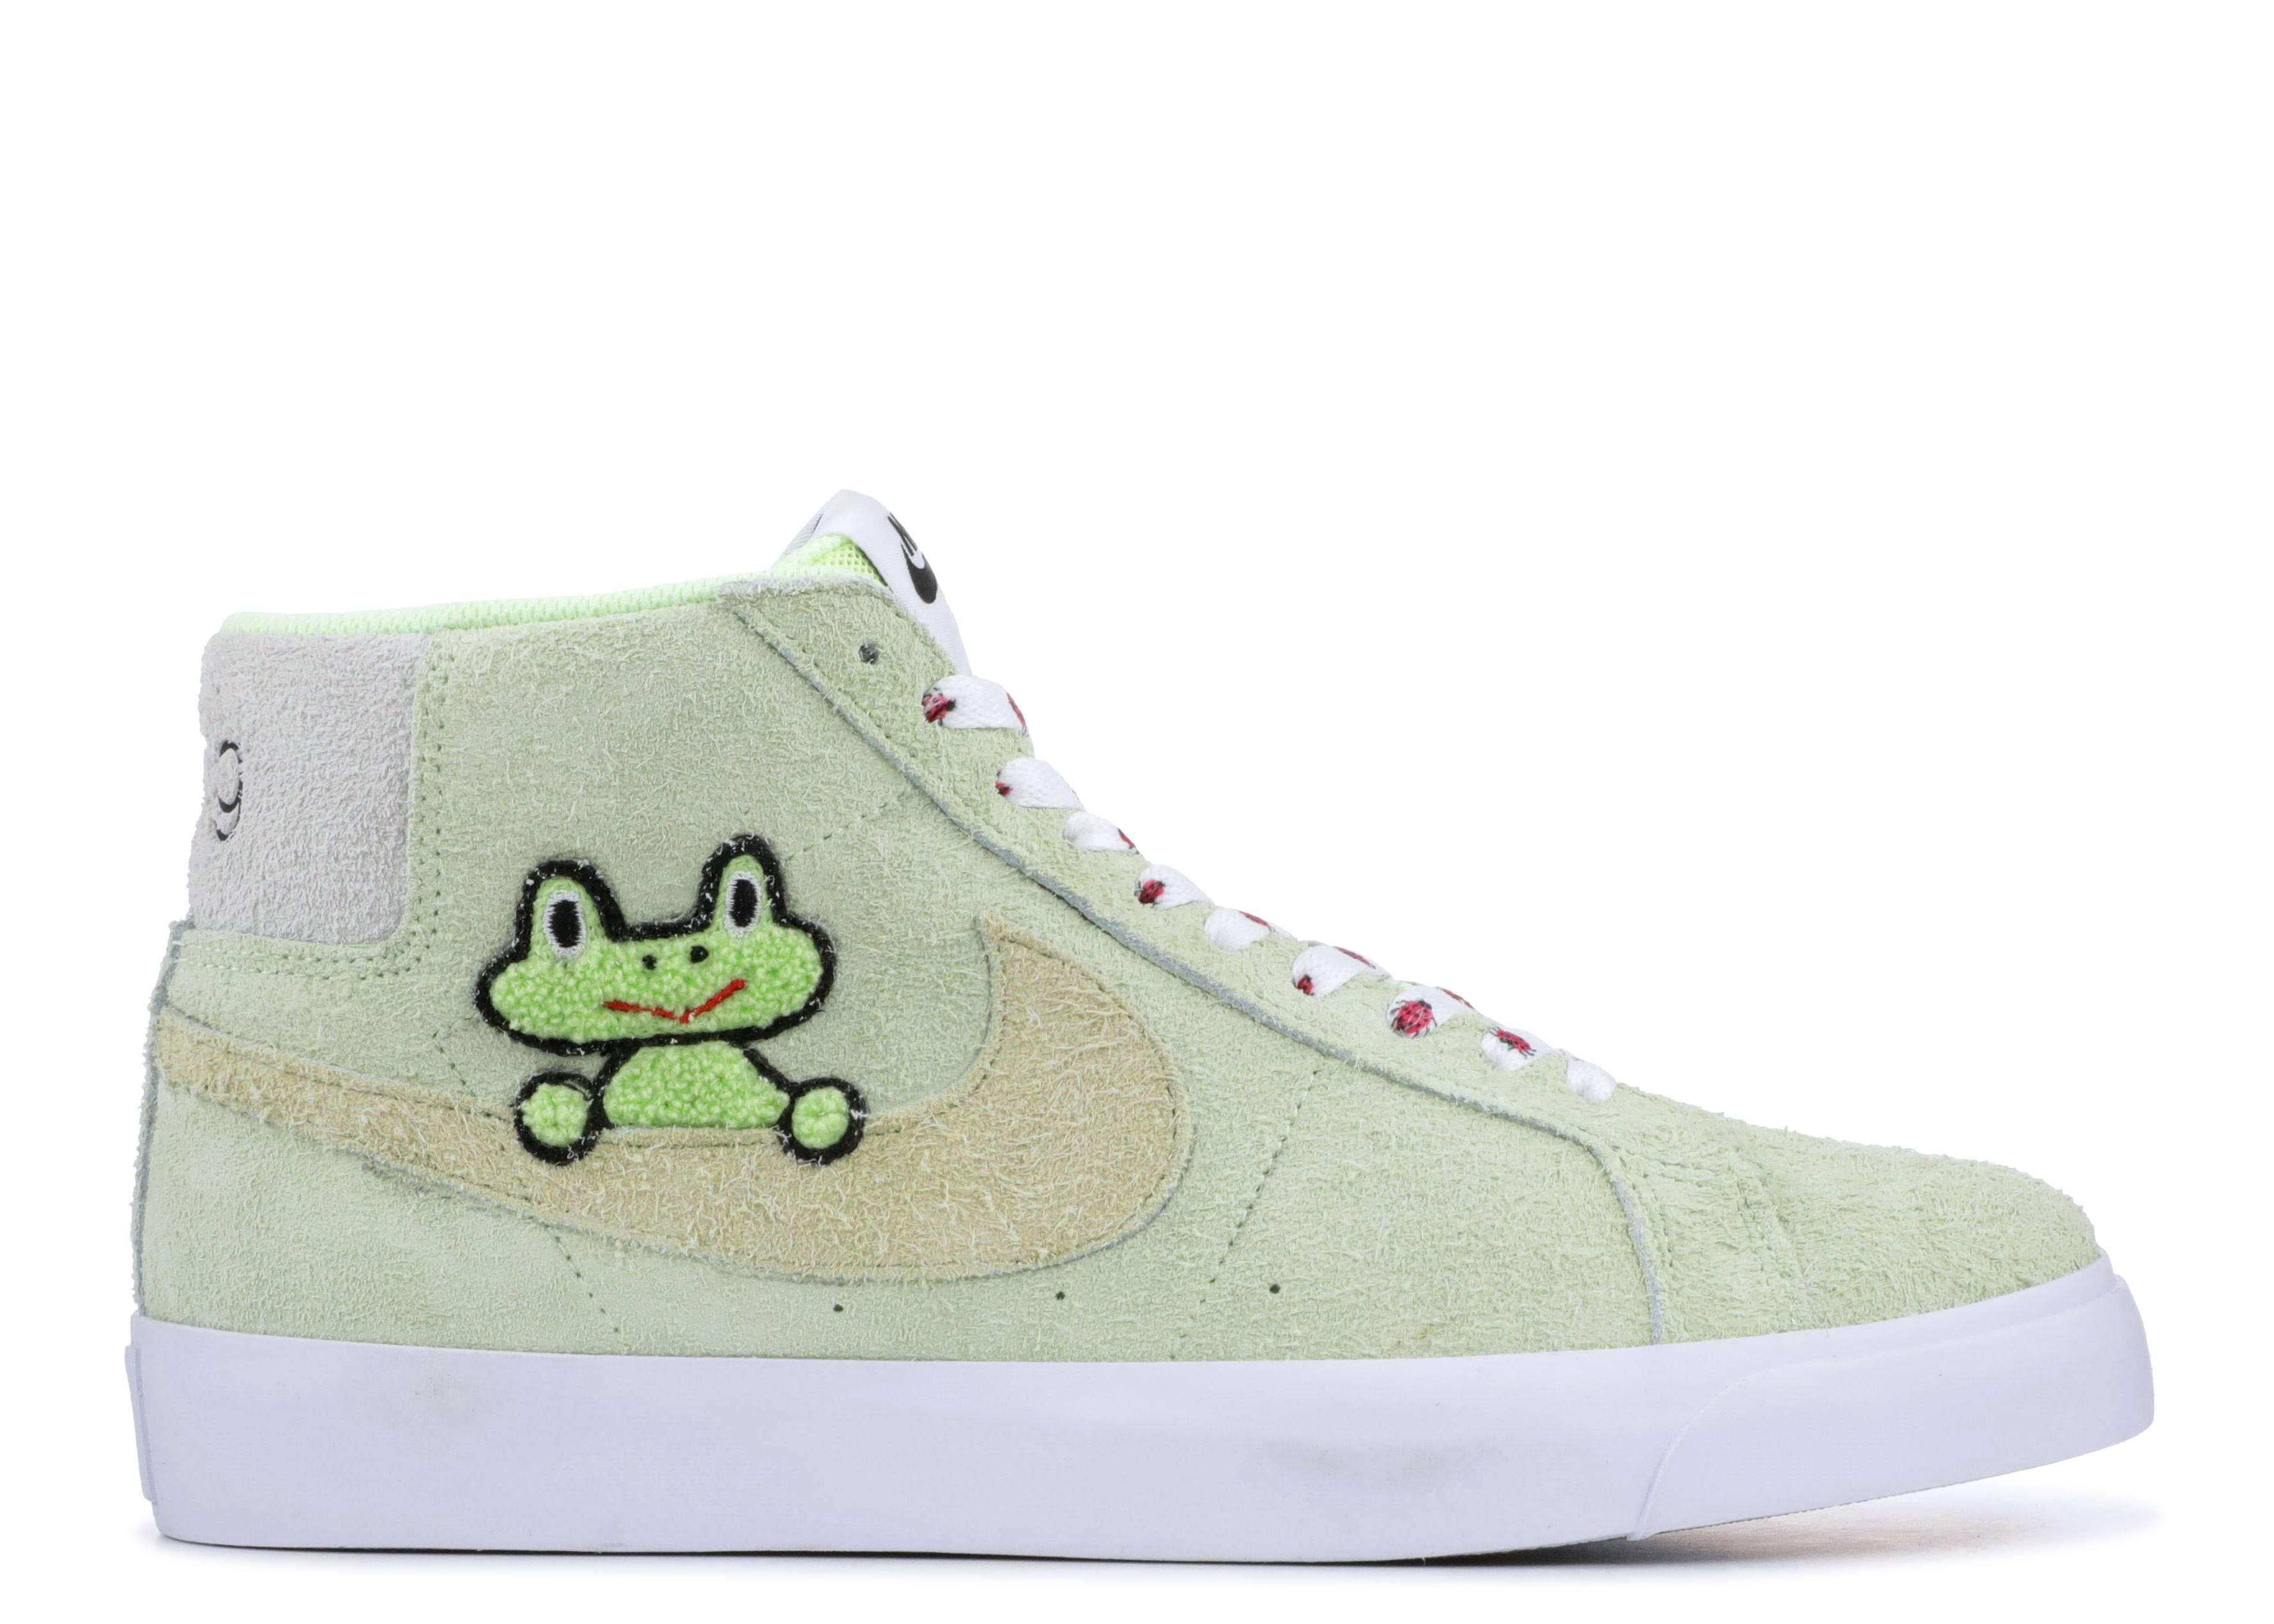 Frog Skateboards X Blazer Mid SB QS